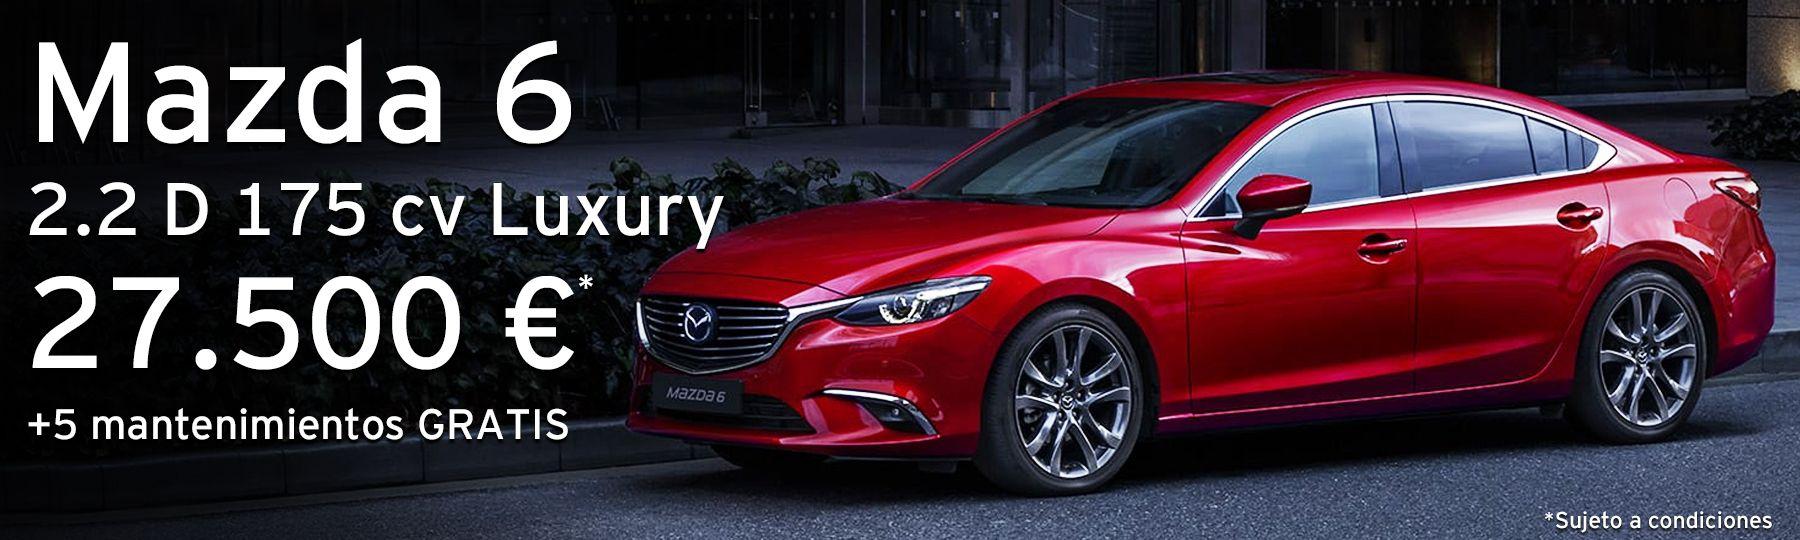 Mazda 6 Sedán 2.2 D 175 cv Luxury